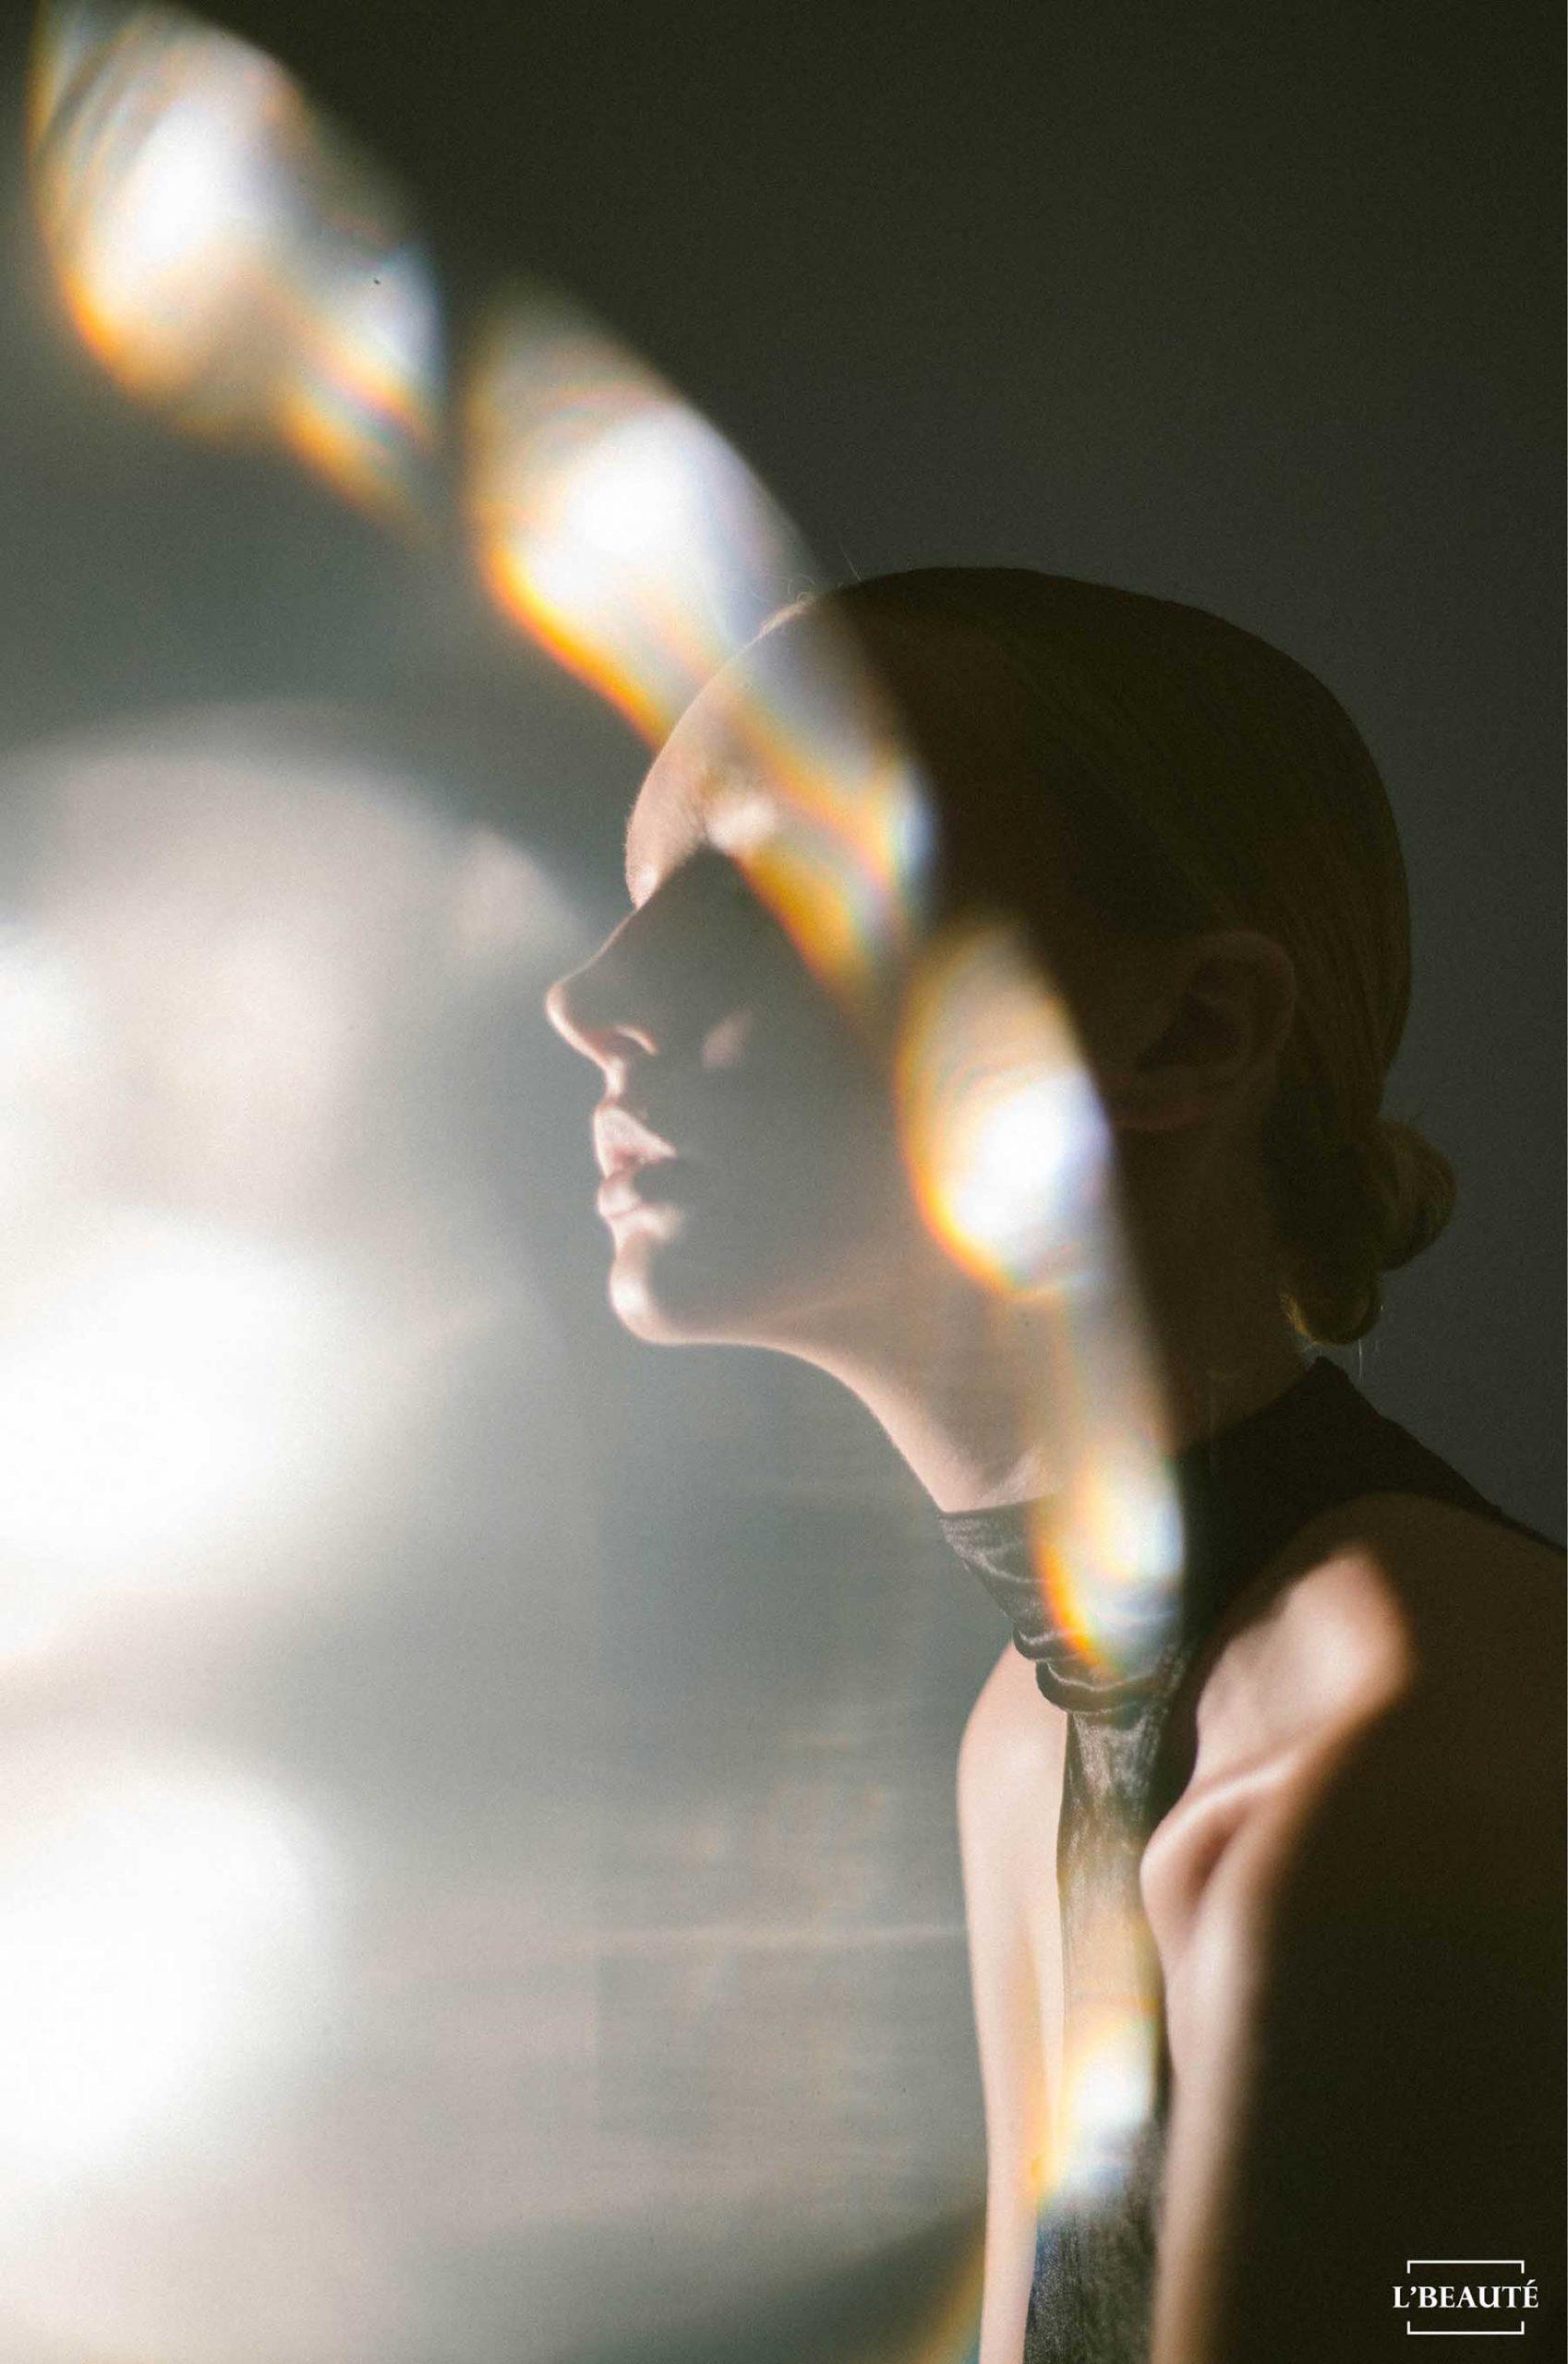 Beauty-Givenchy-Nicolas-Degennes11